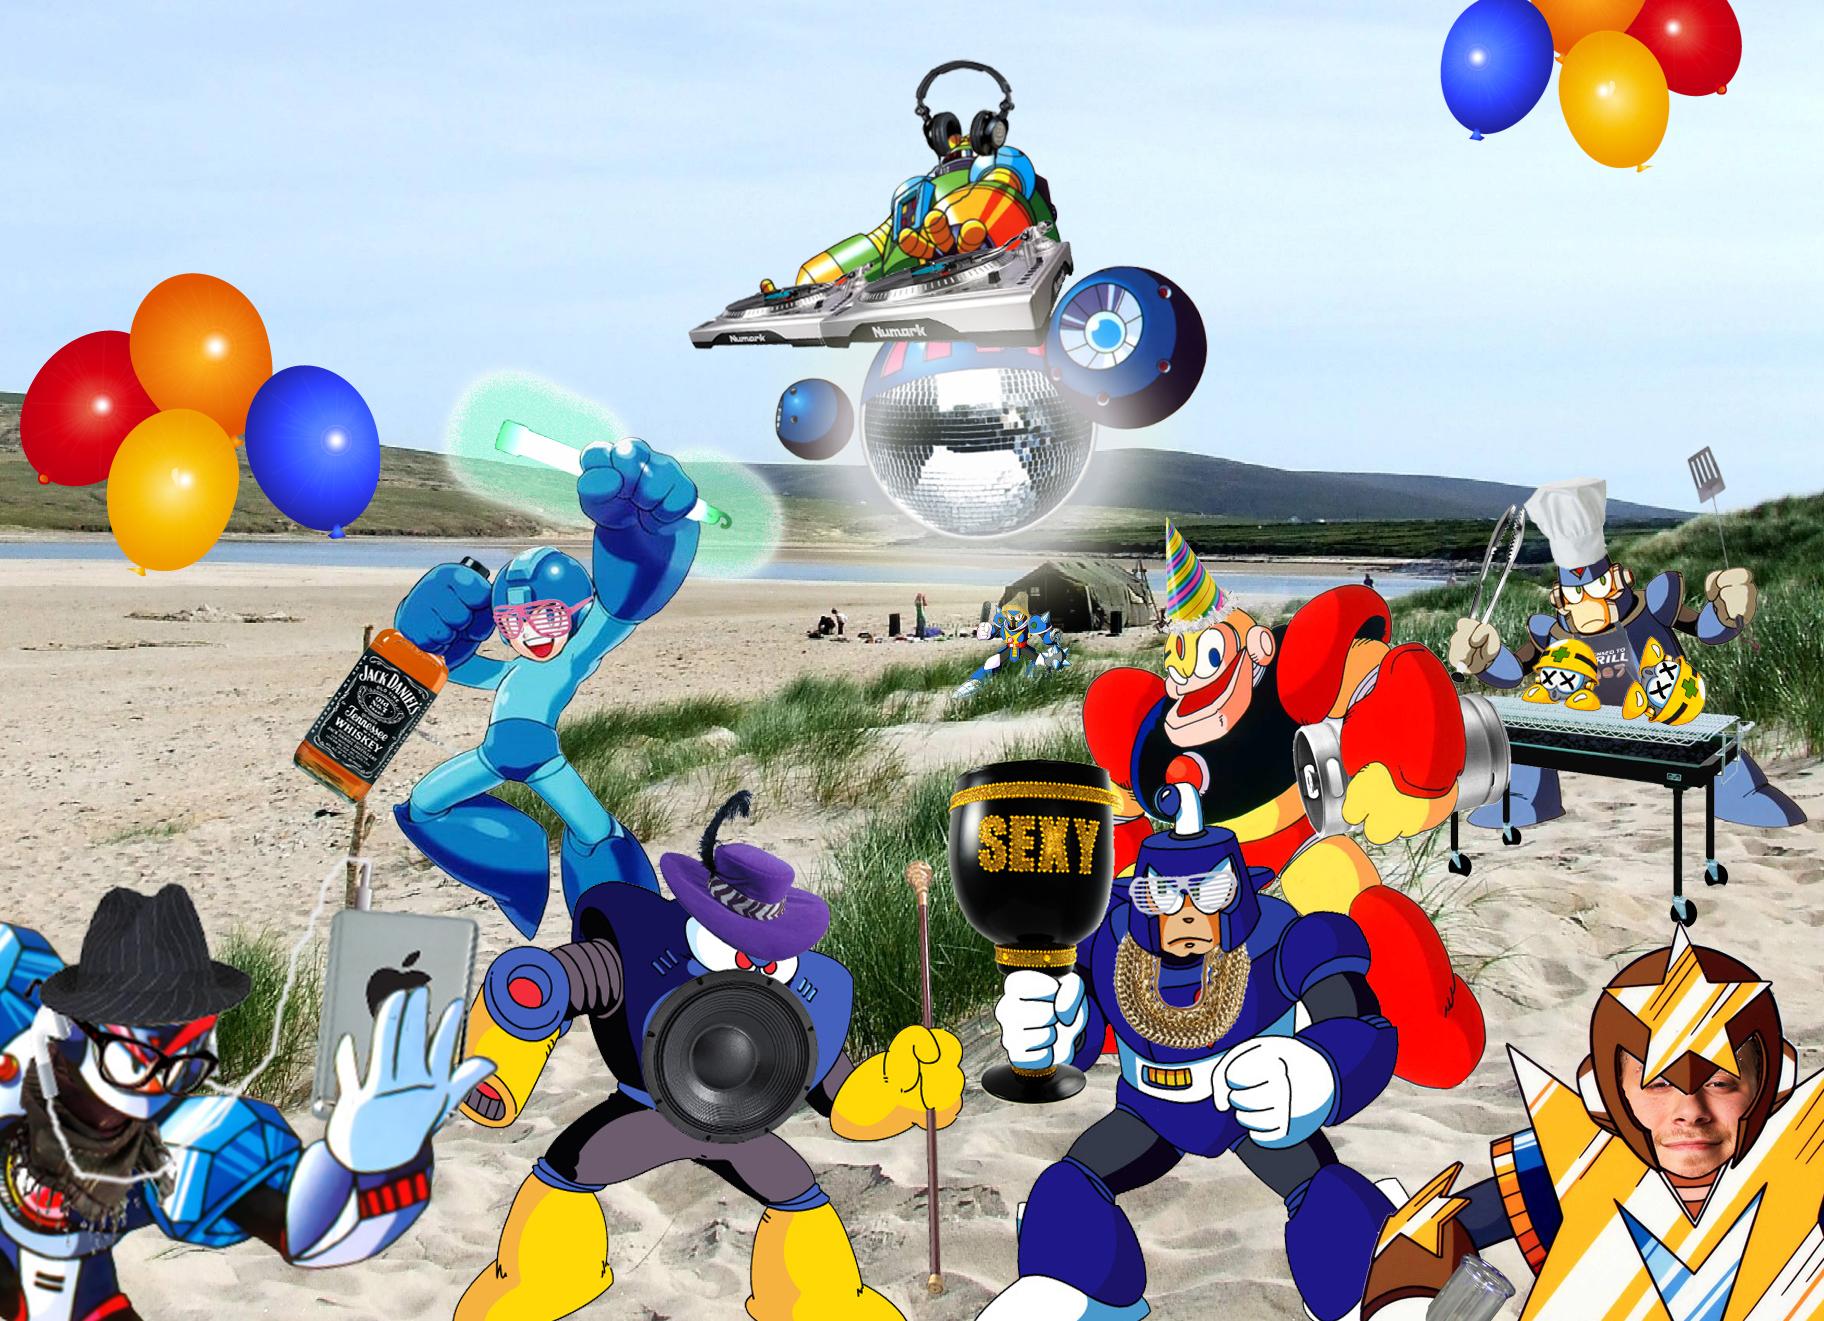 Bass And Treble Megaman 8 Bit